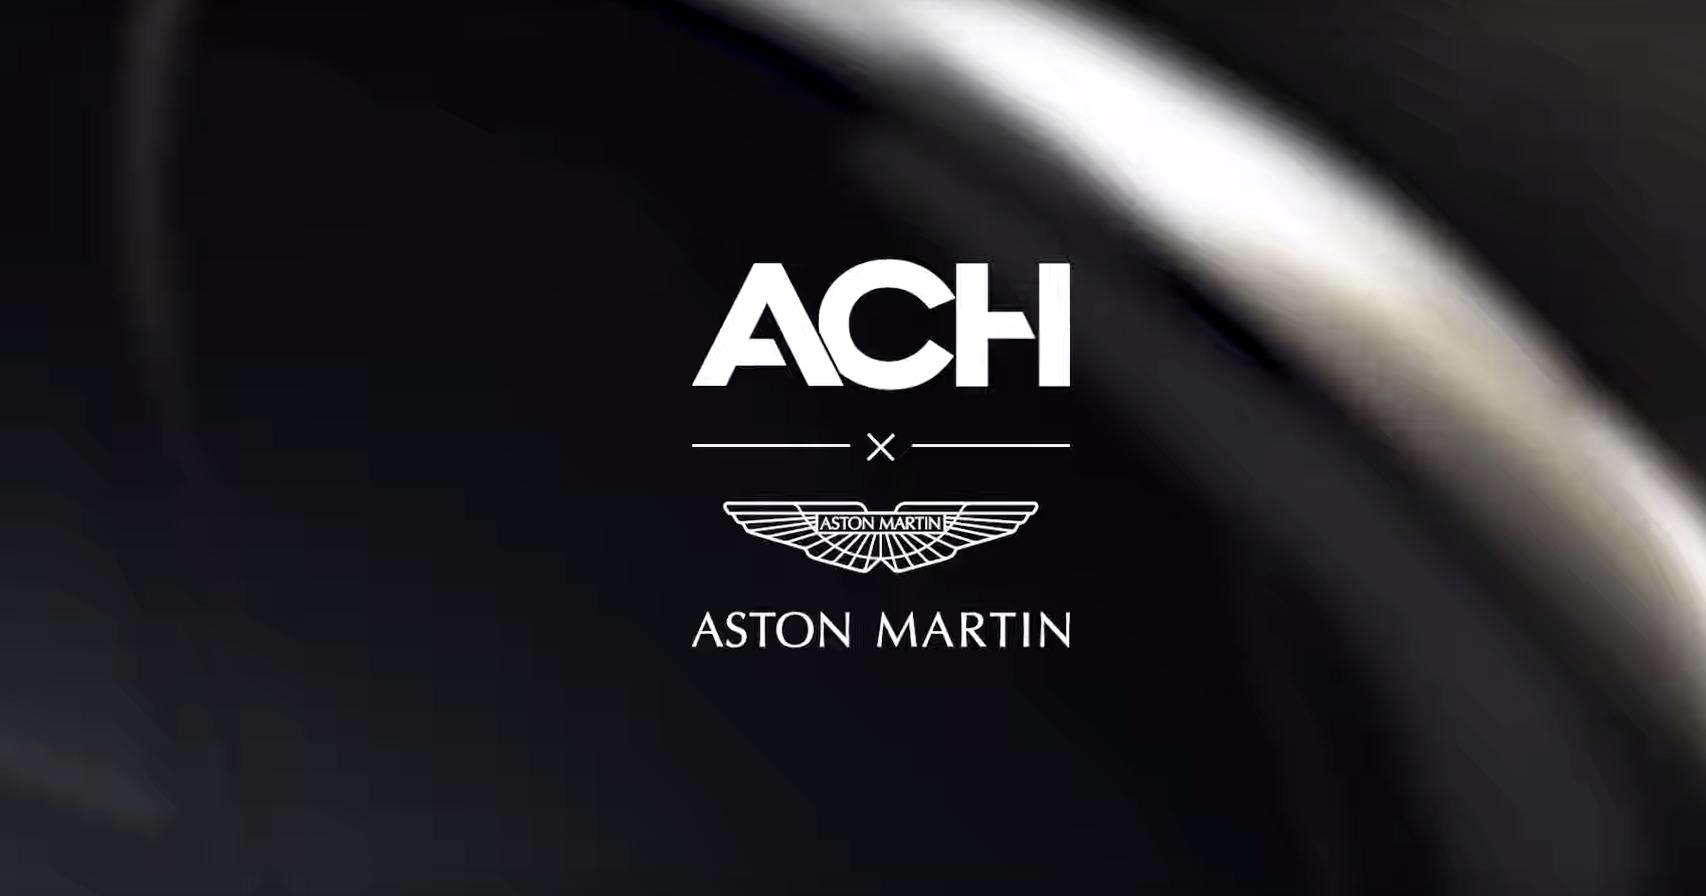 Airbus и Aston Martin разрабатывают вертолет